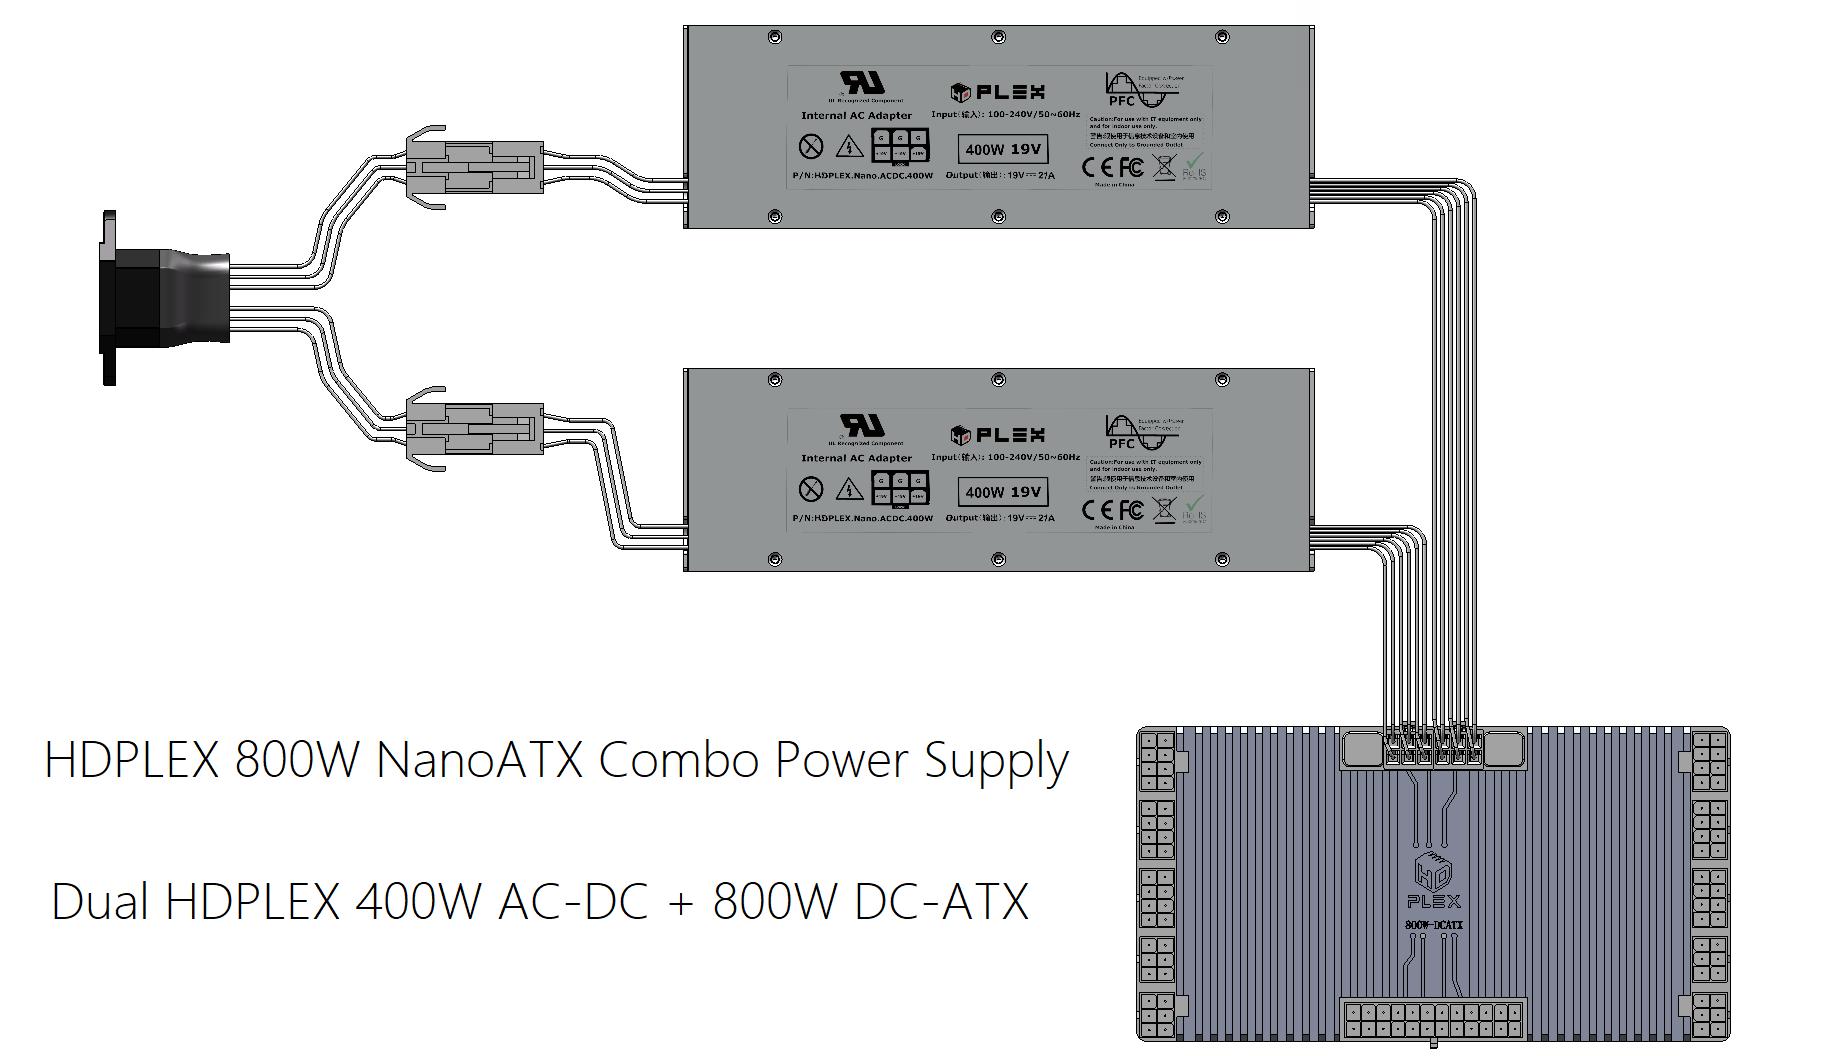 HDPLEX 400W AC-DC on